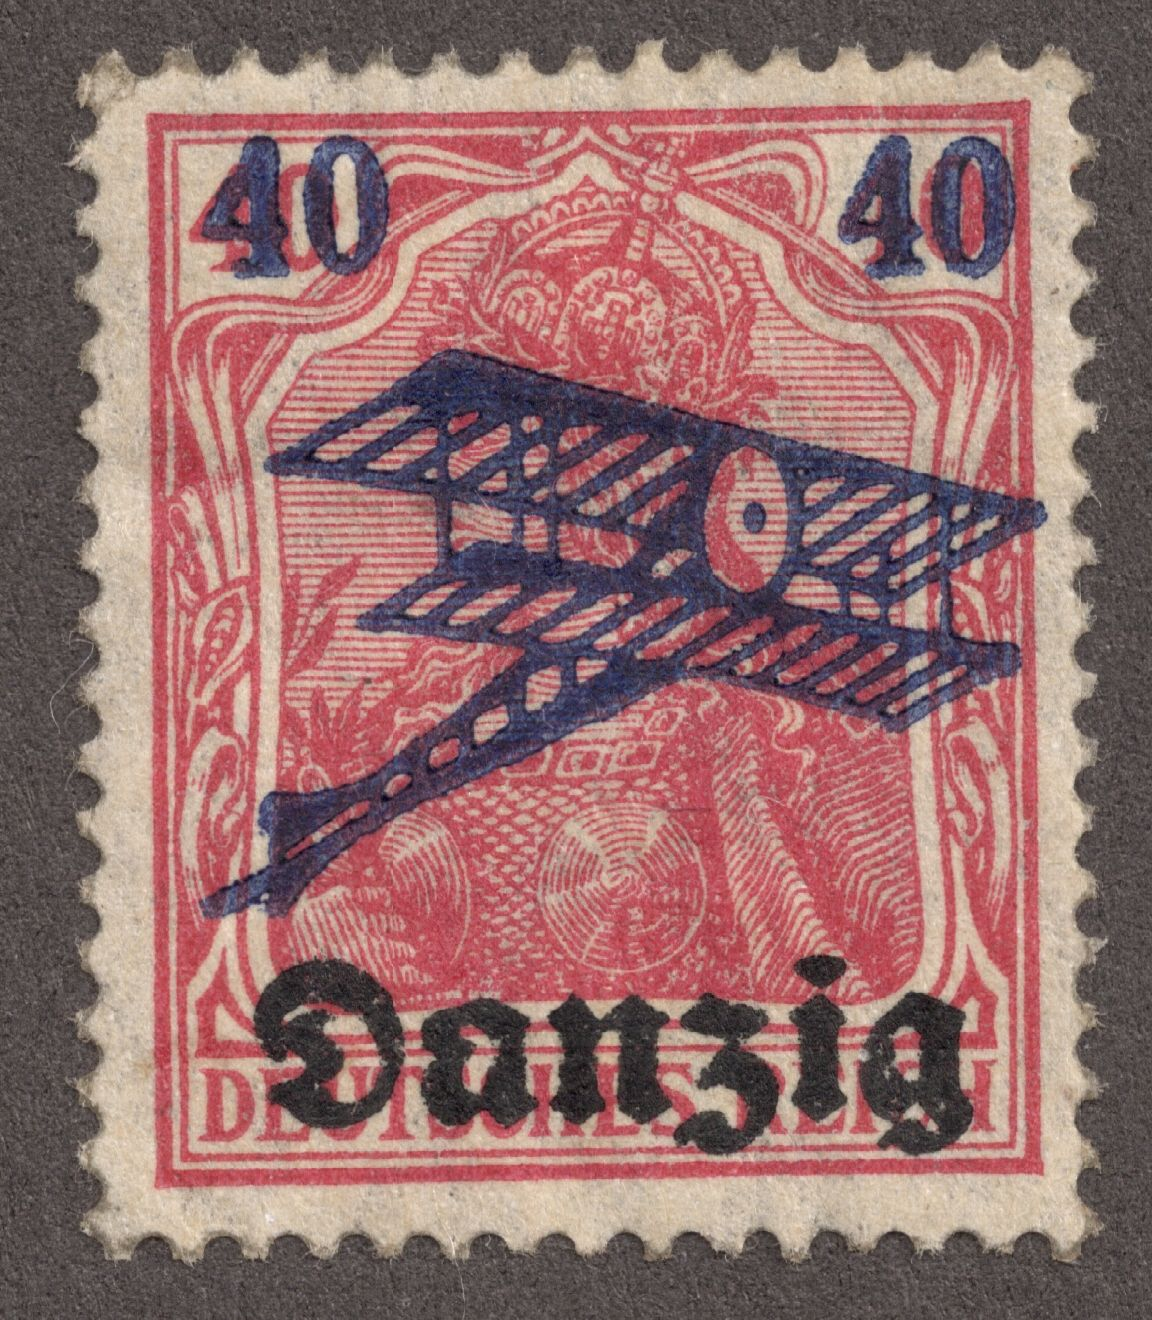 Danzig german stamp at World War II (I got 1 page of